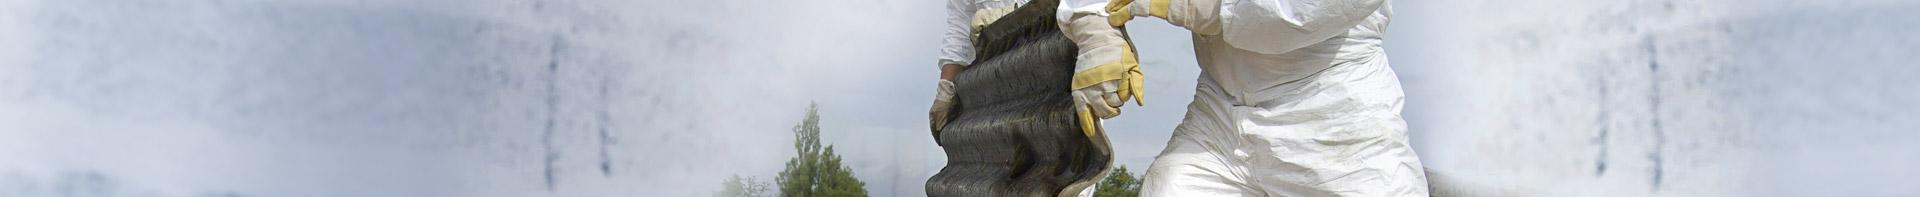 inventaire amiante asbestos. Black Bedroom Furniture Sets. Home Design Ideas